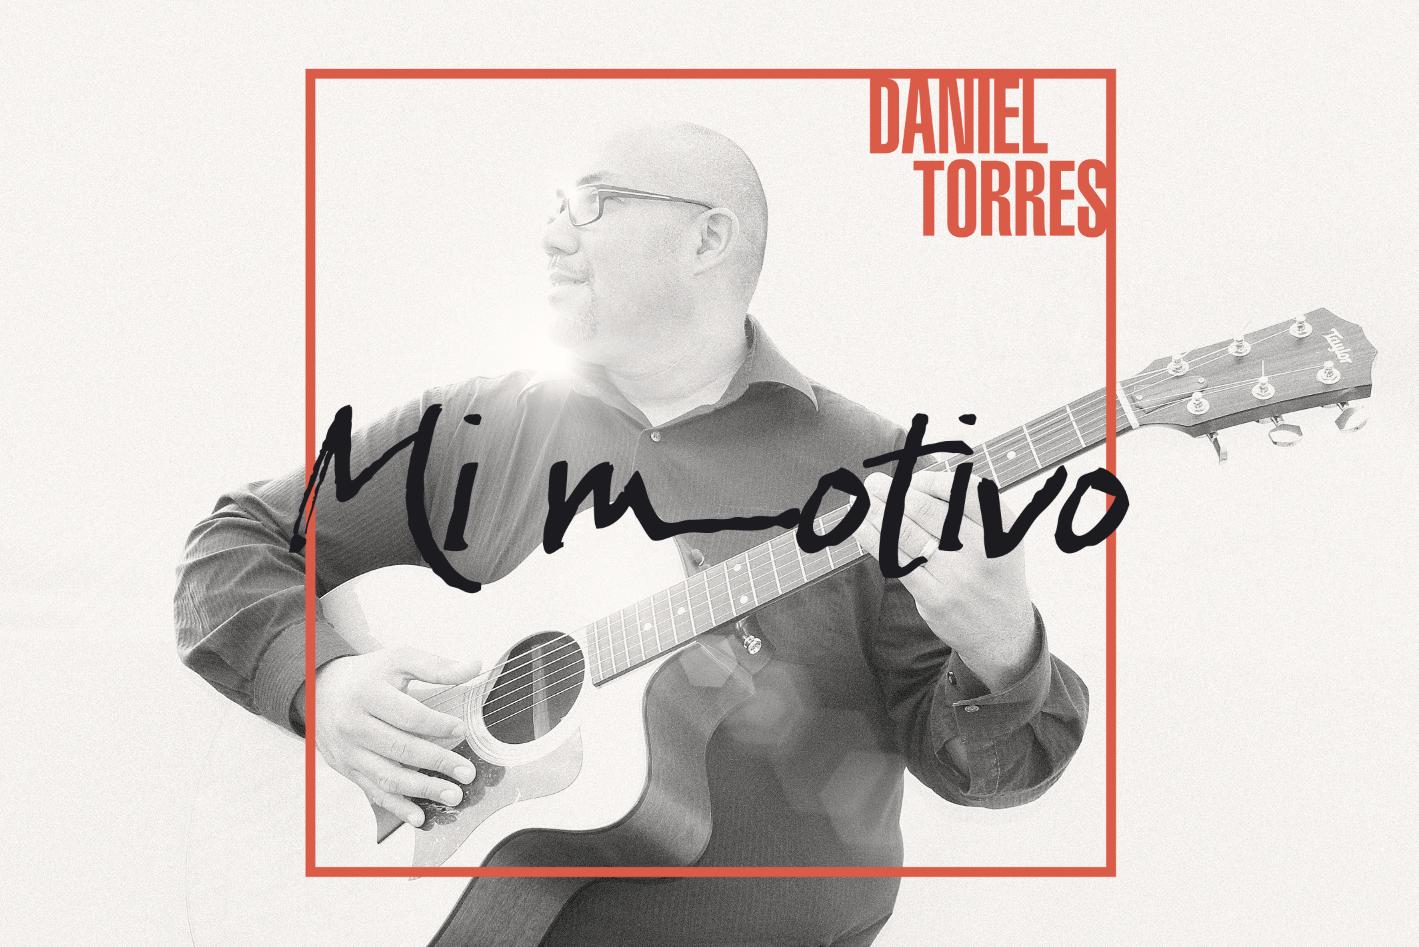 Daniel Torres Musician  - Master Graphic